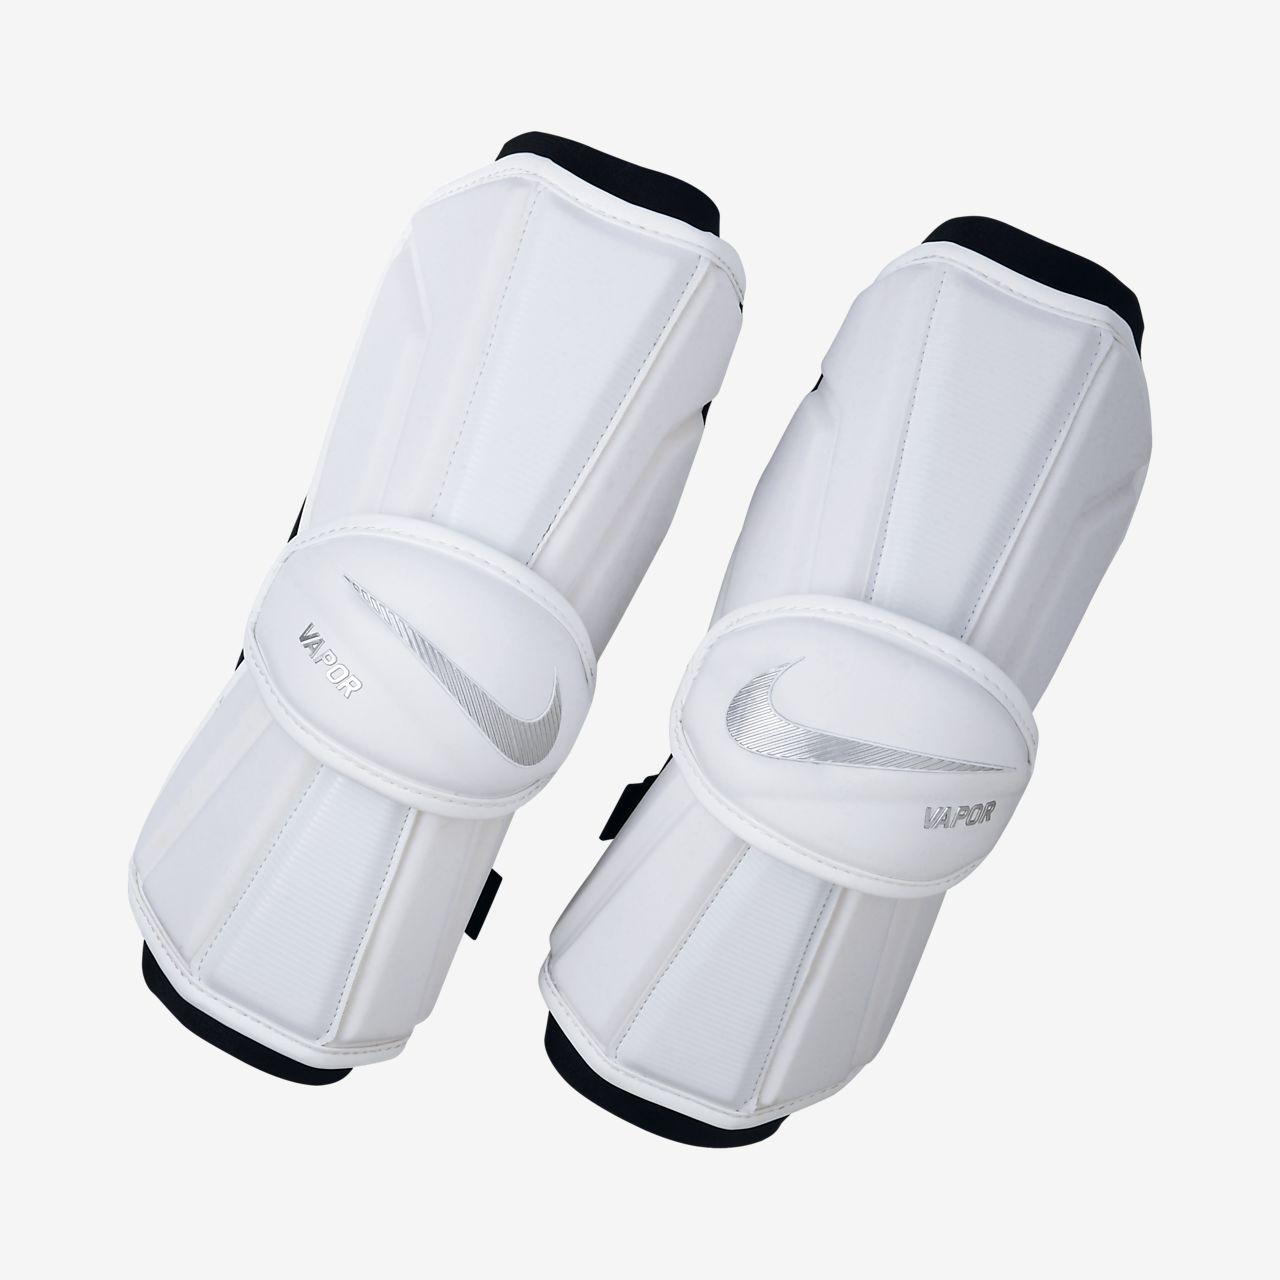 Nike Vapor 2.0 Lacrosse Arm Guards